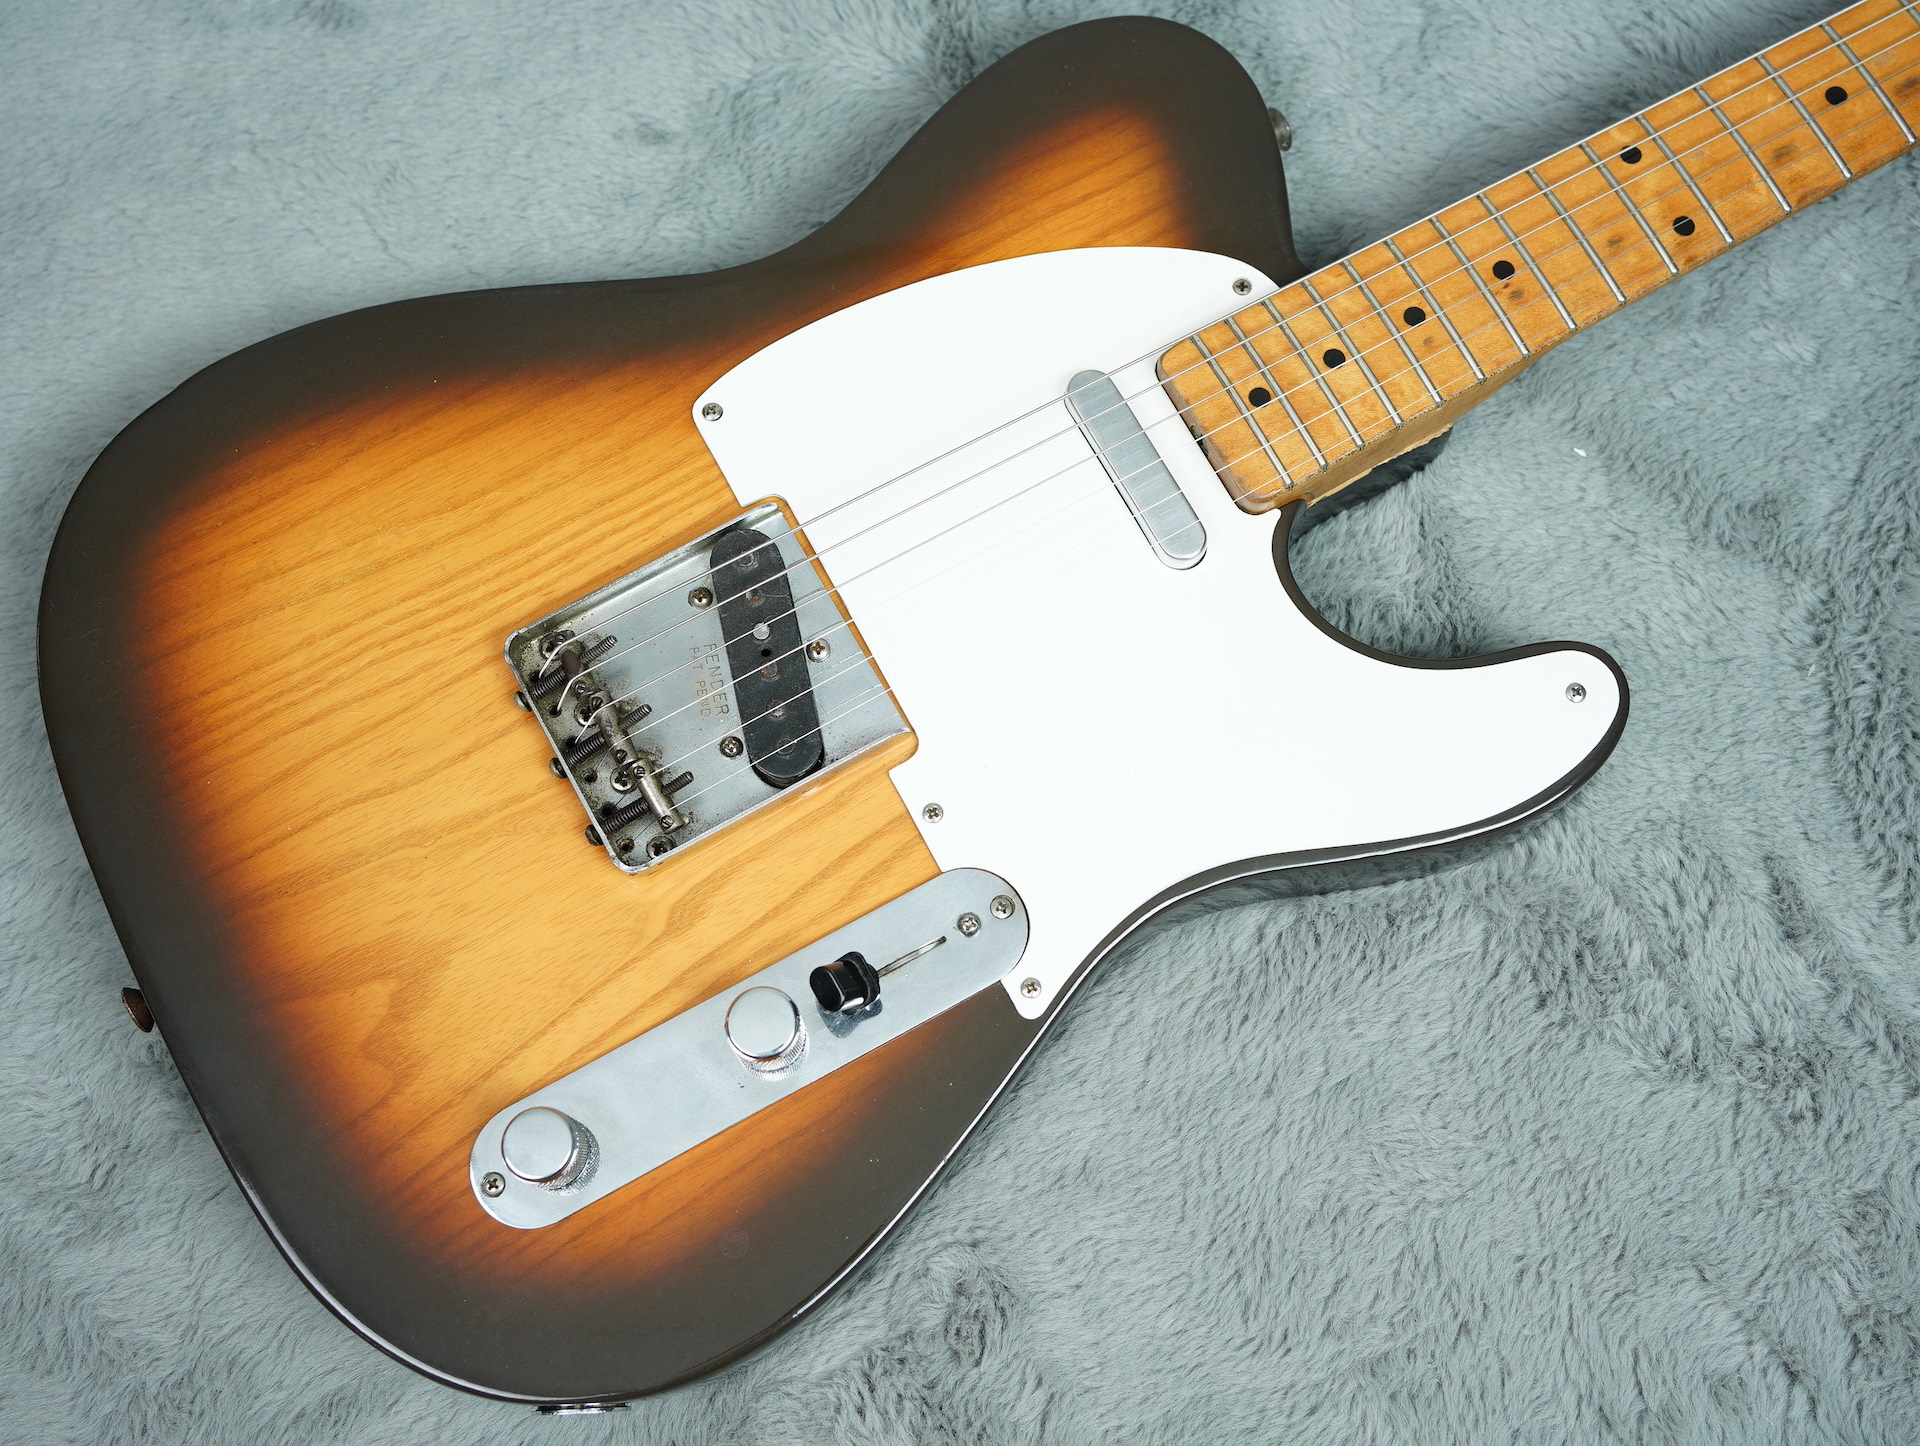 1957 Fender Telecaster refin + HSC